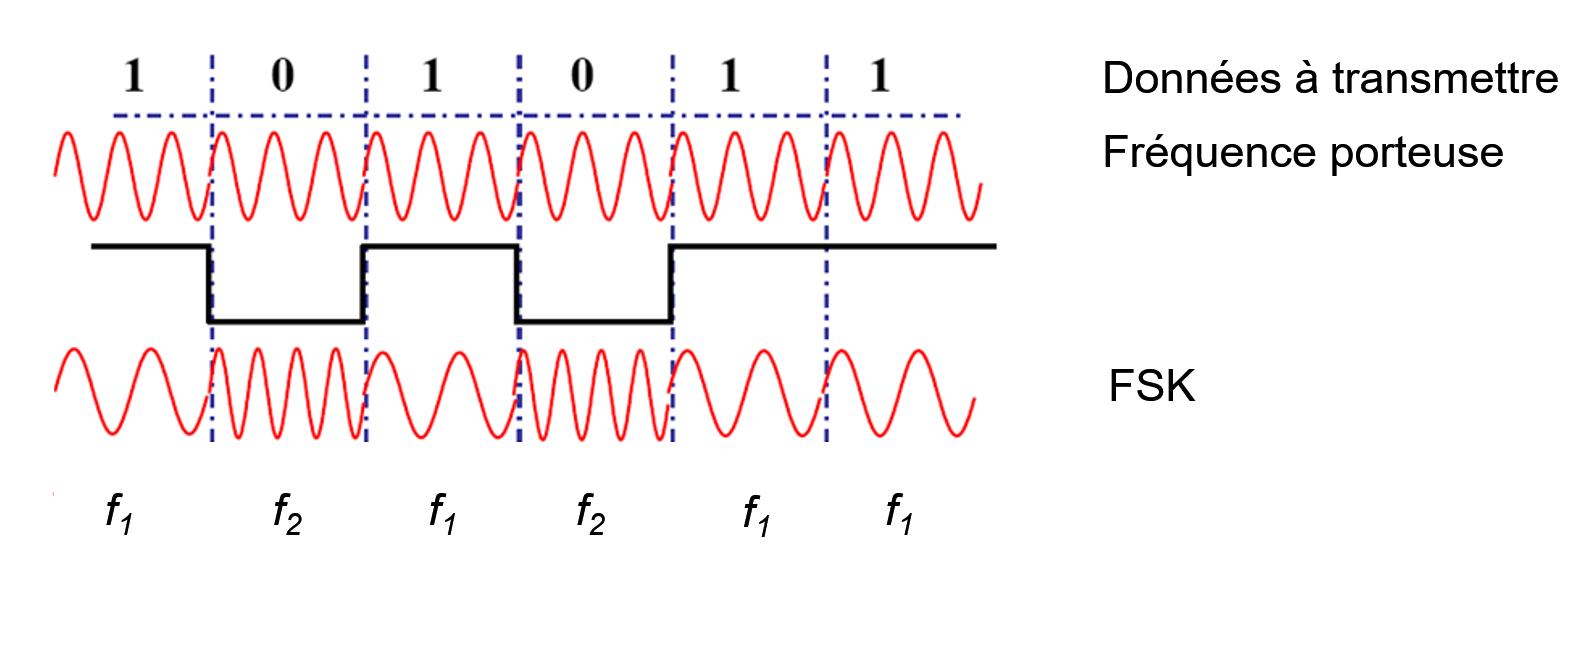 L'allure d'un signal de type FSK (